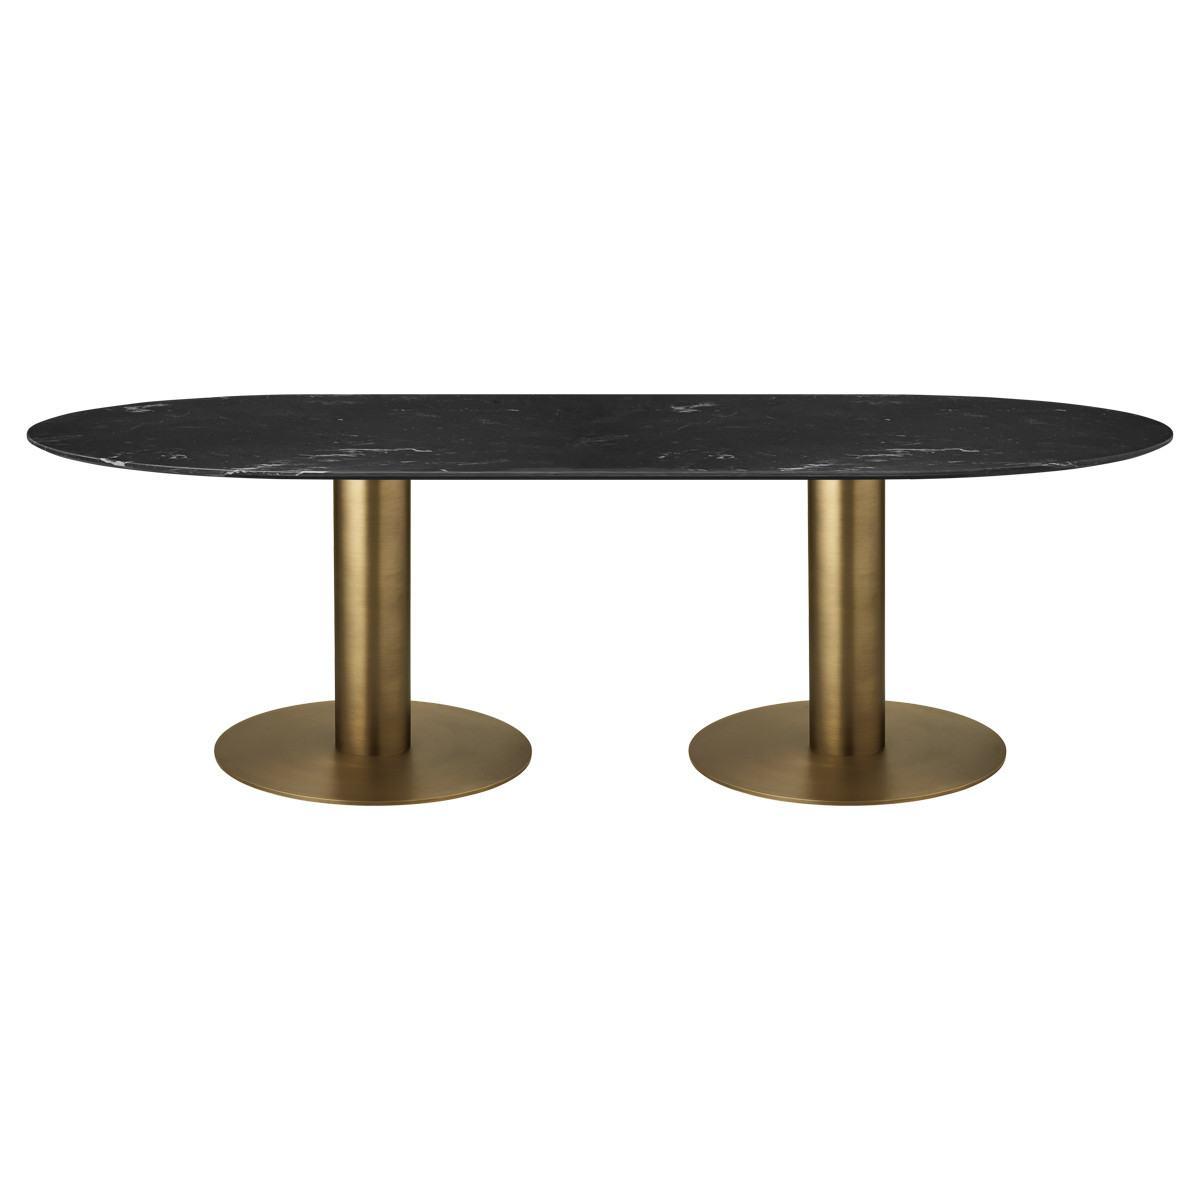 GUBI 2.0 Dining Table - Elliptical - 130x240